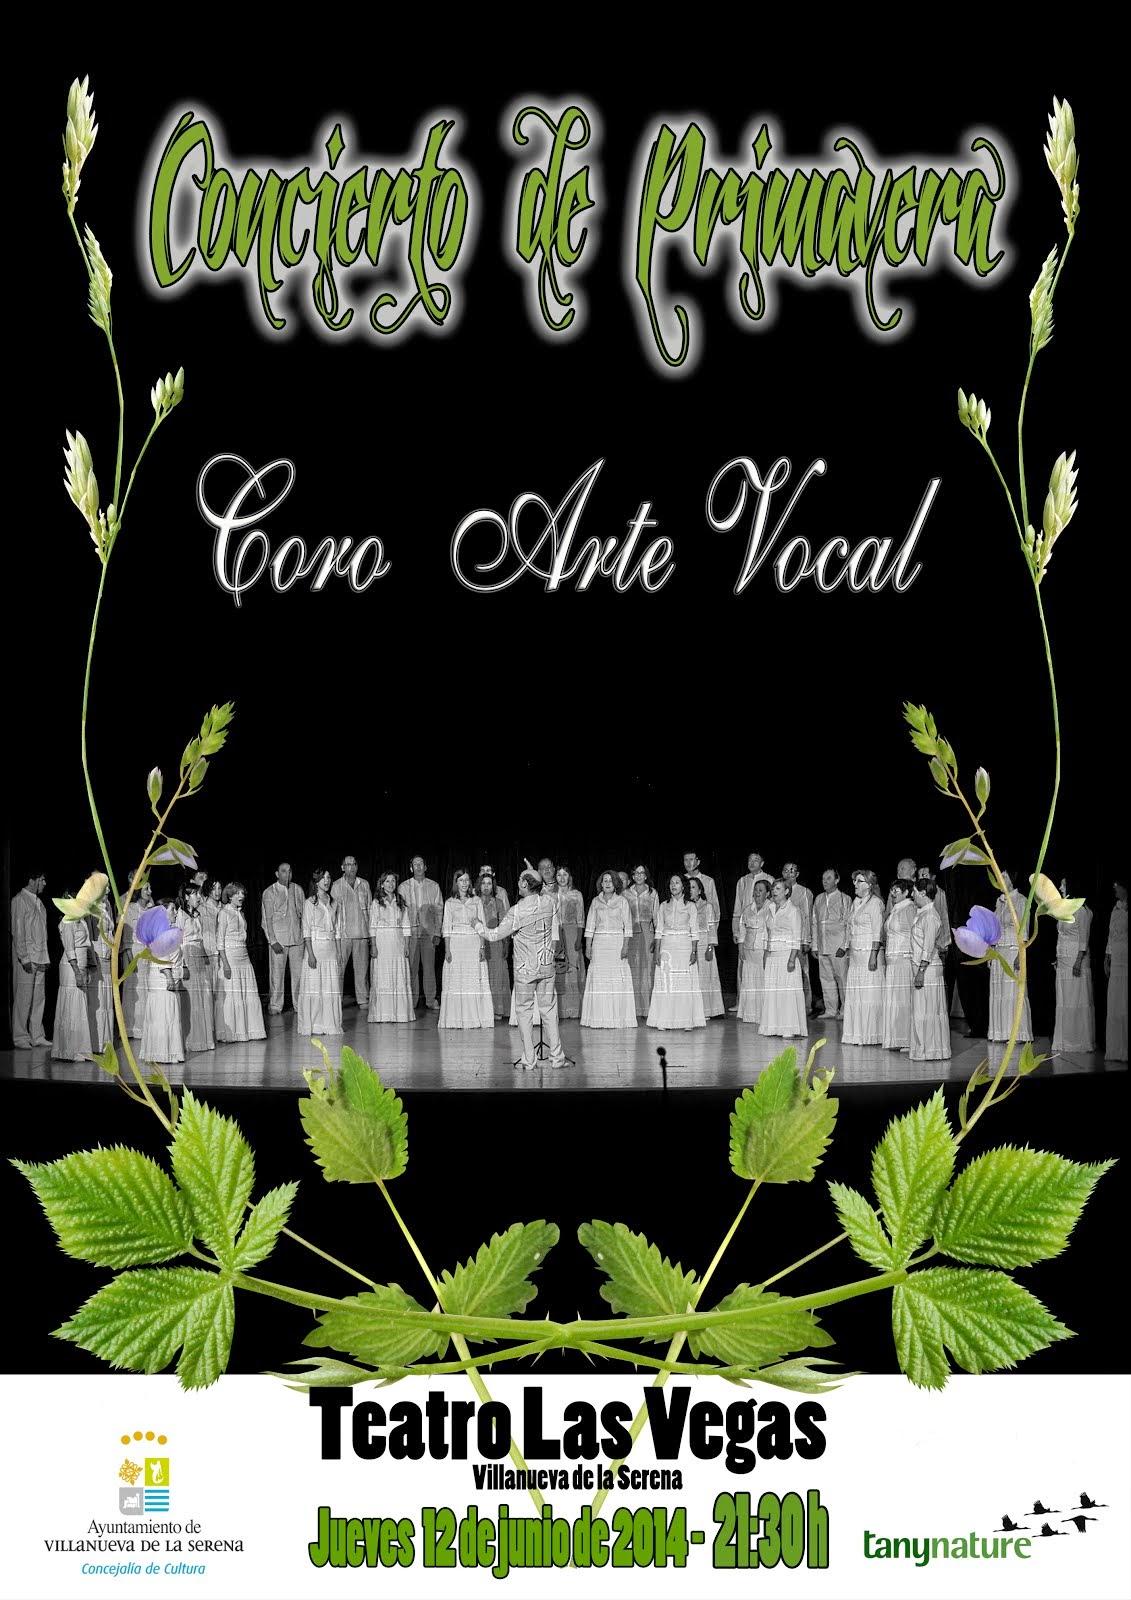 Concierto de Primavera del Coro Arte Vocal